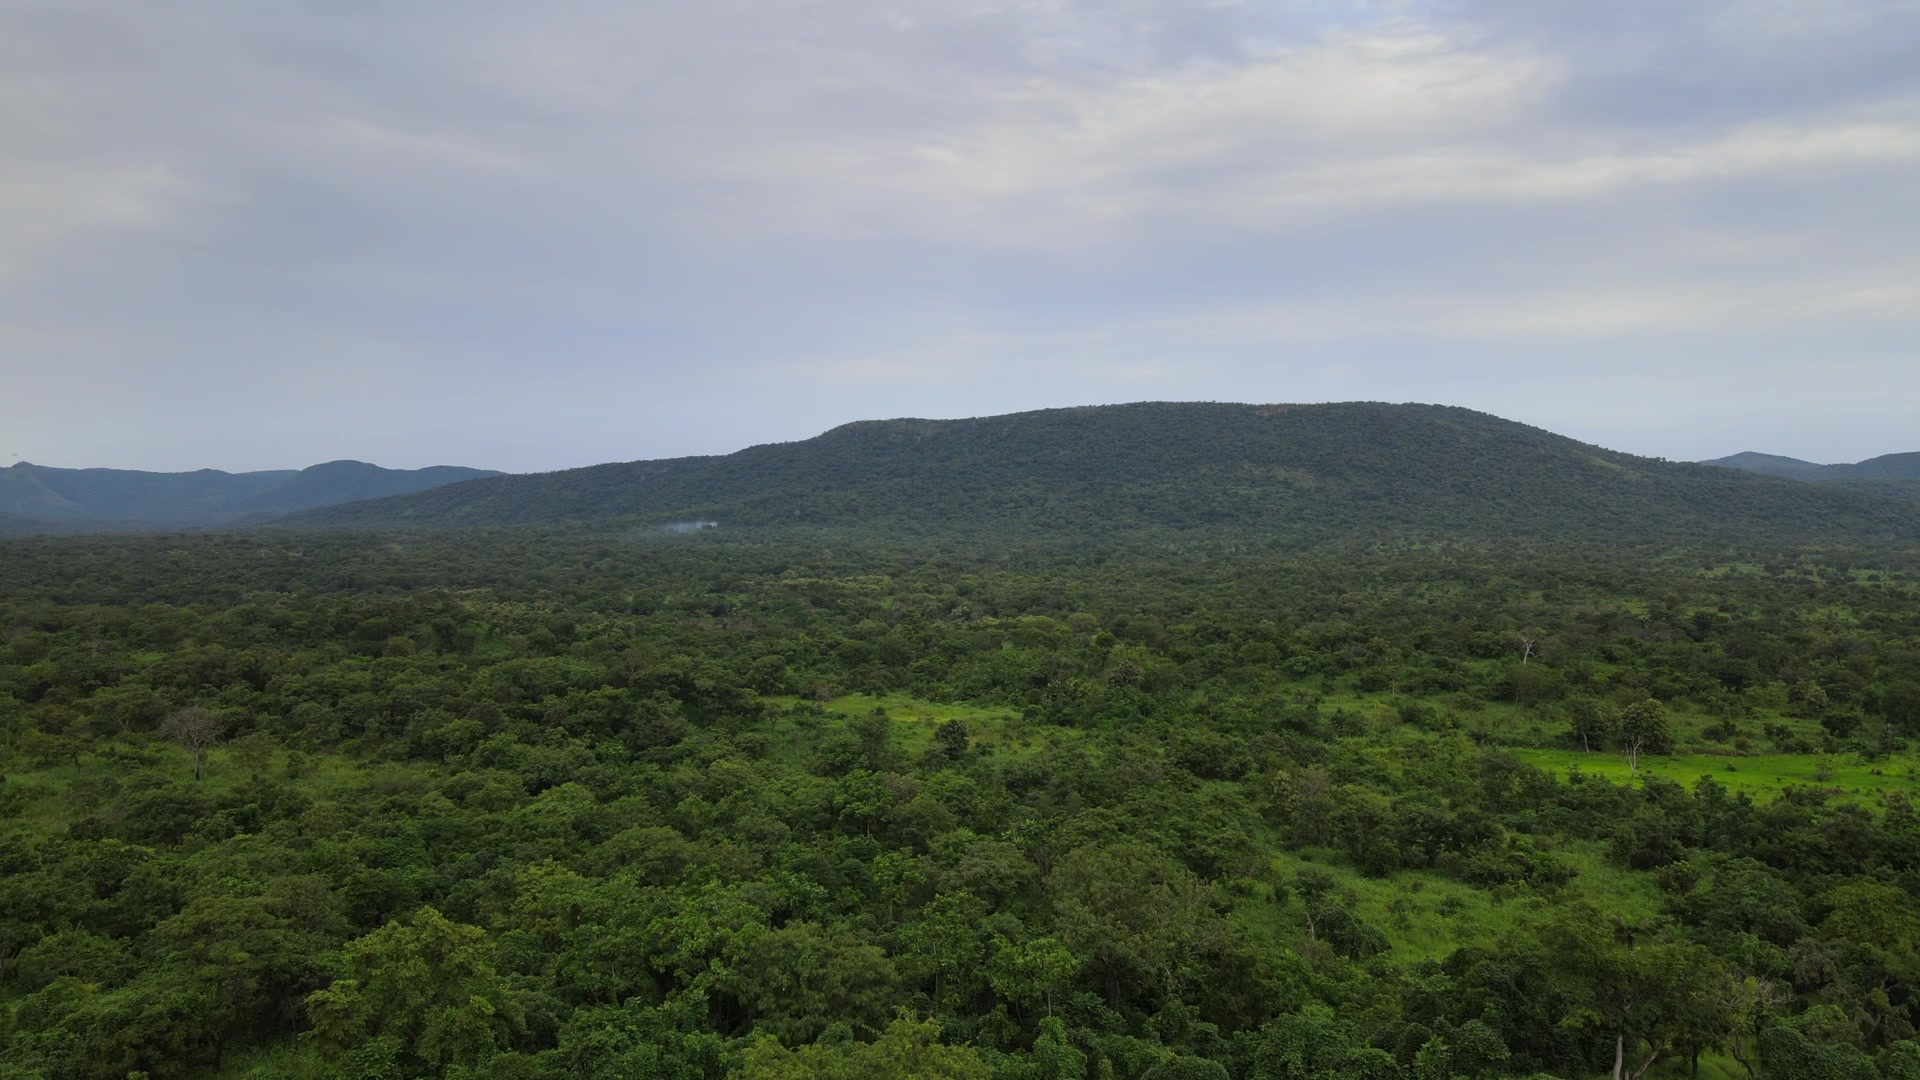 Lanscape Grassland Mountain Hills Vegetation